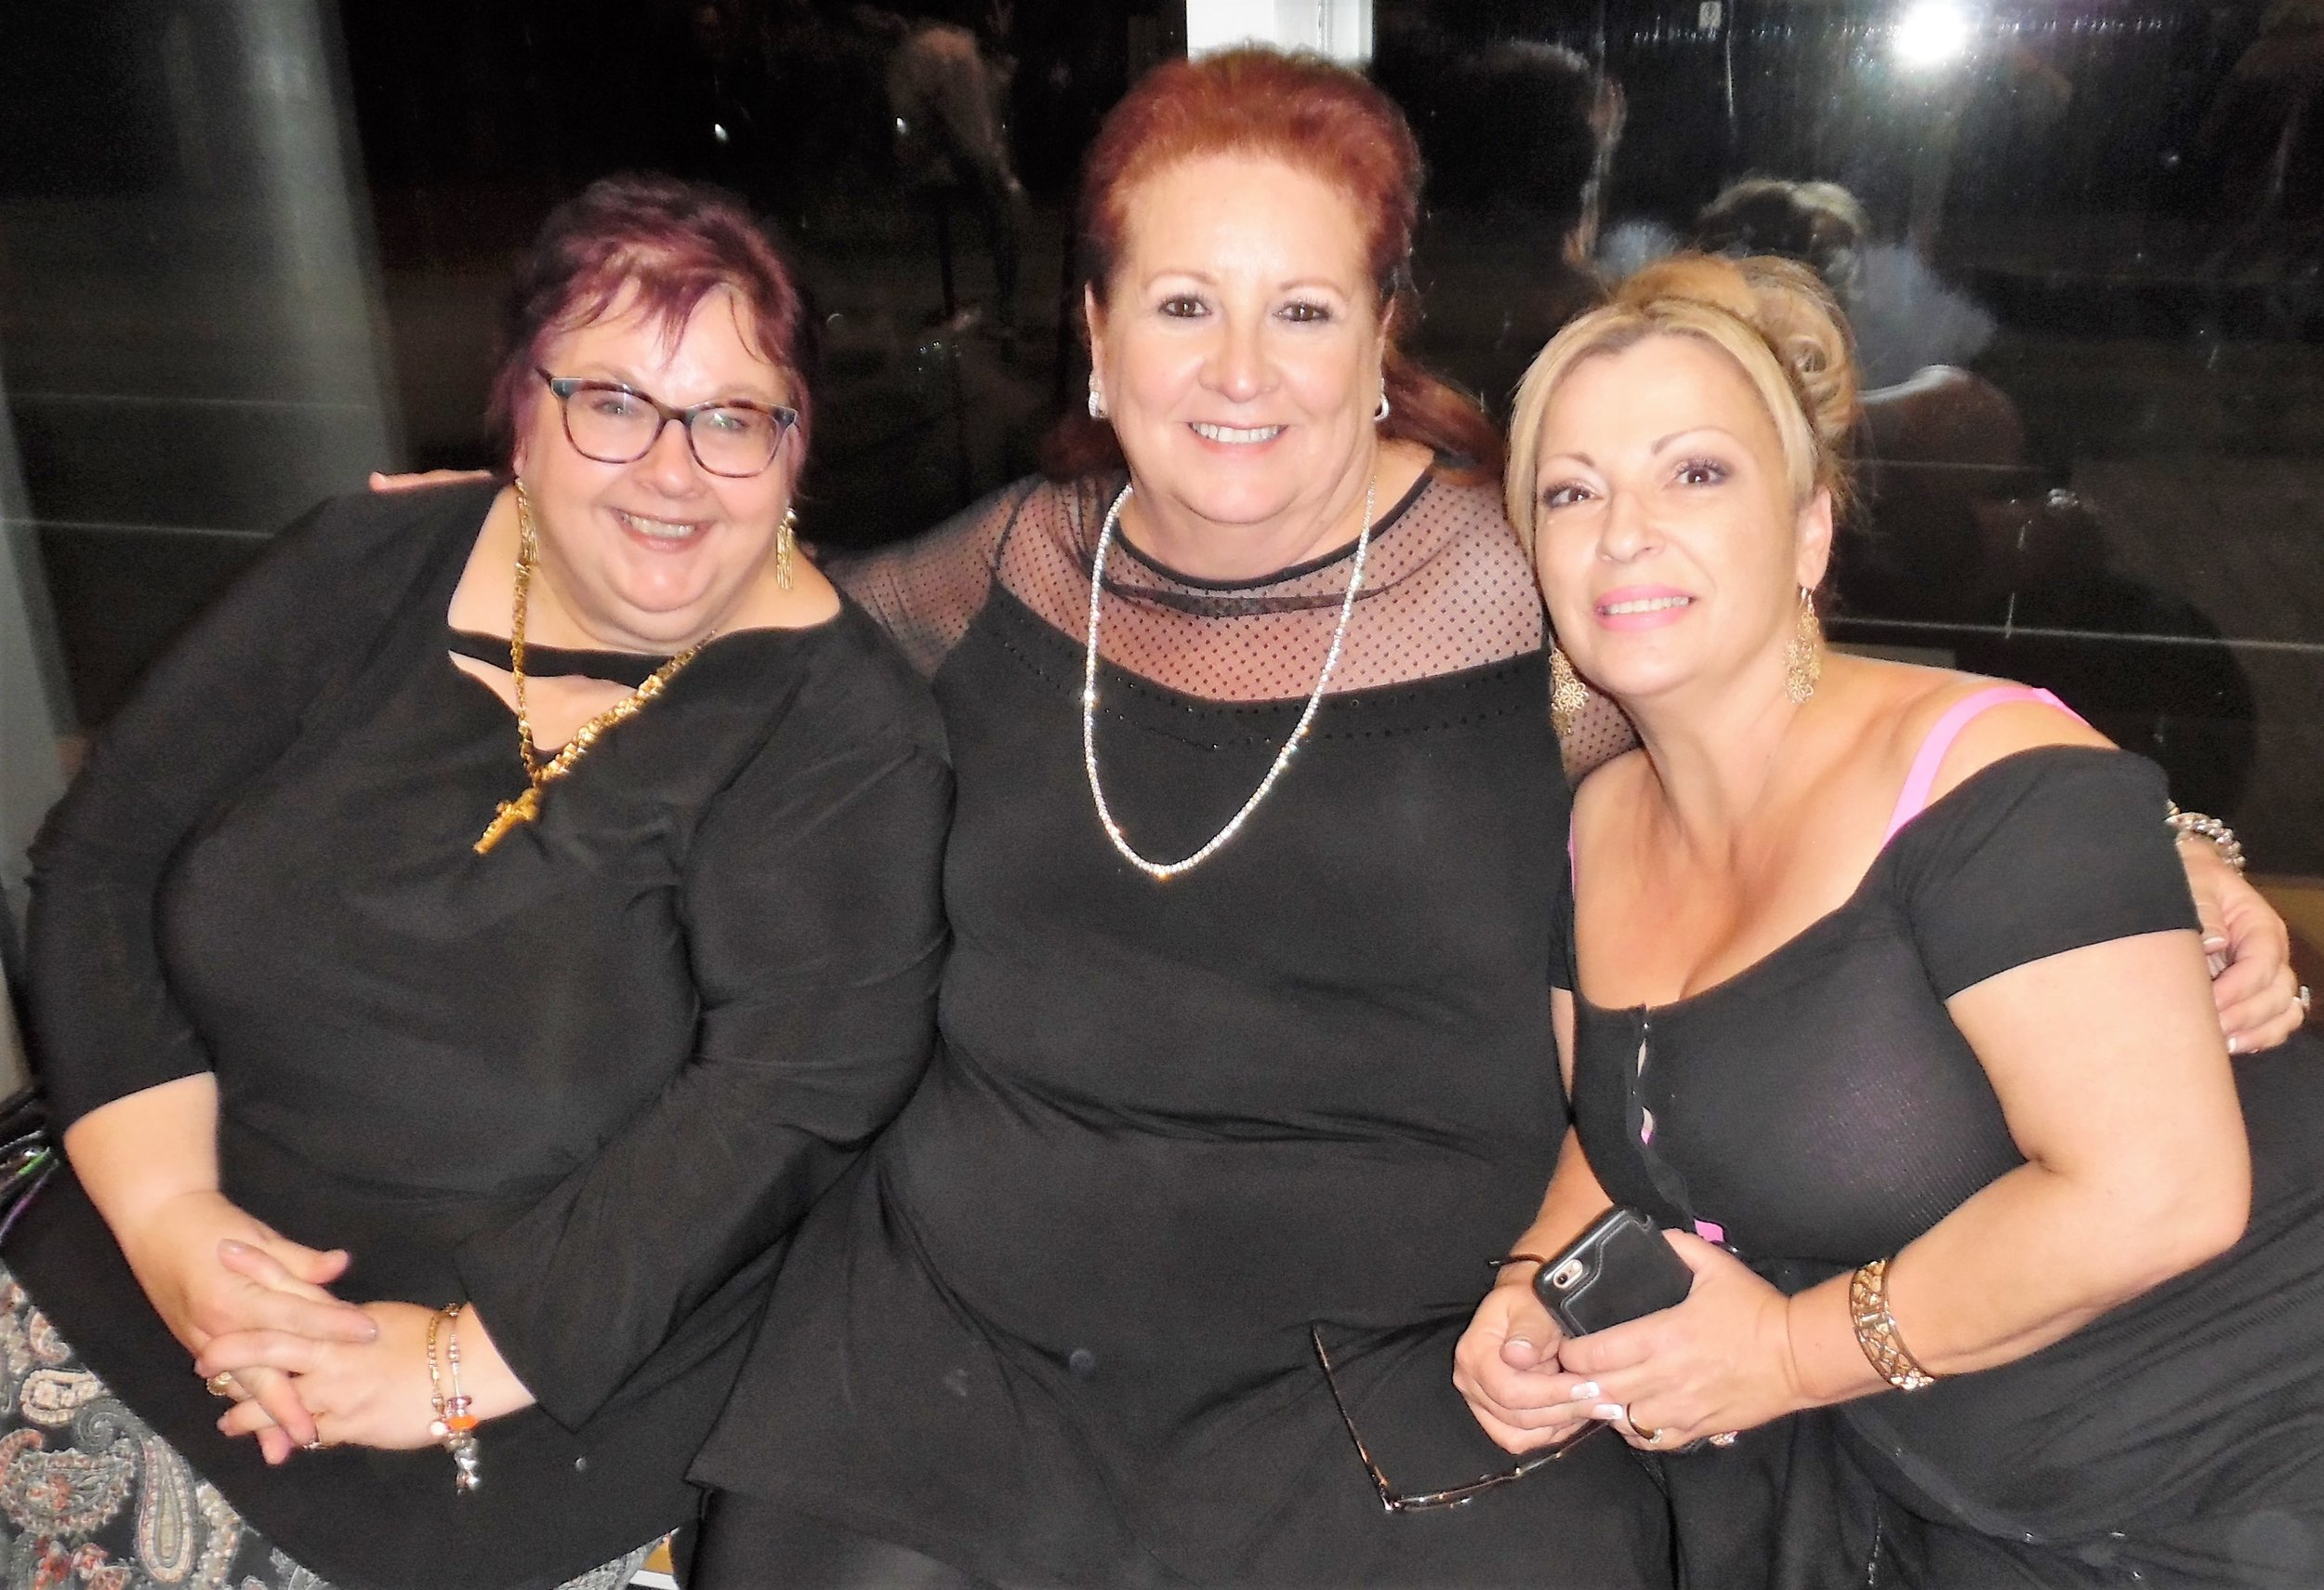 Wendy, Sue, and Rita after  Gordon Hendricks ' concertin Niagara Falls, October 21st, 2017